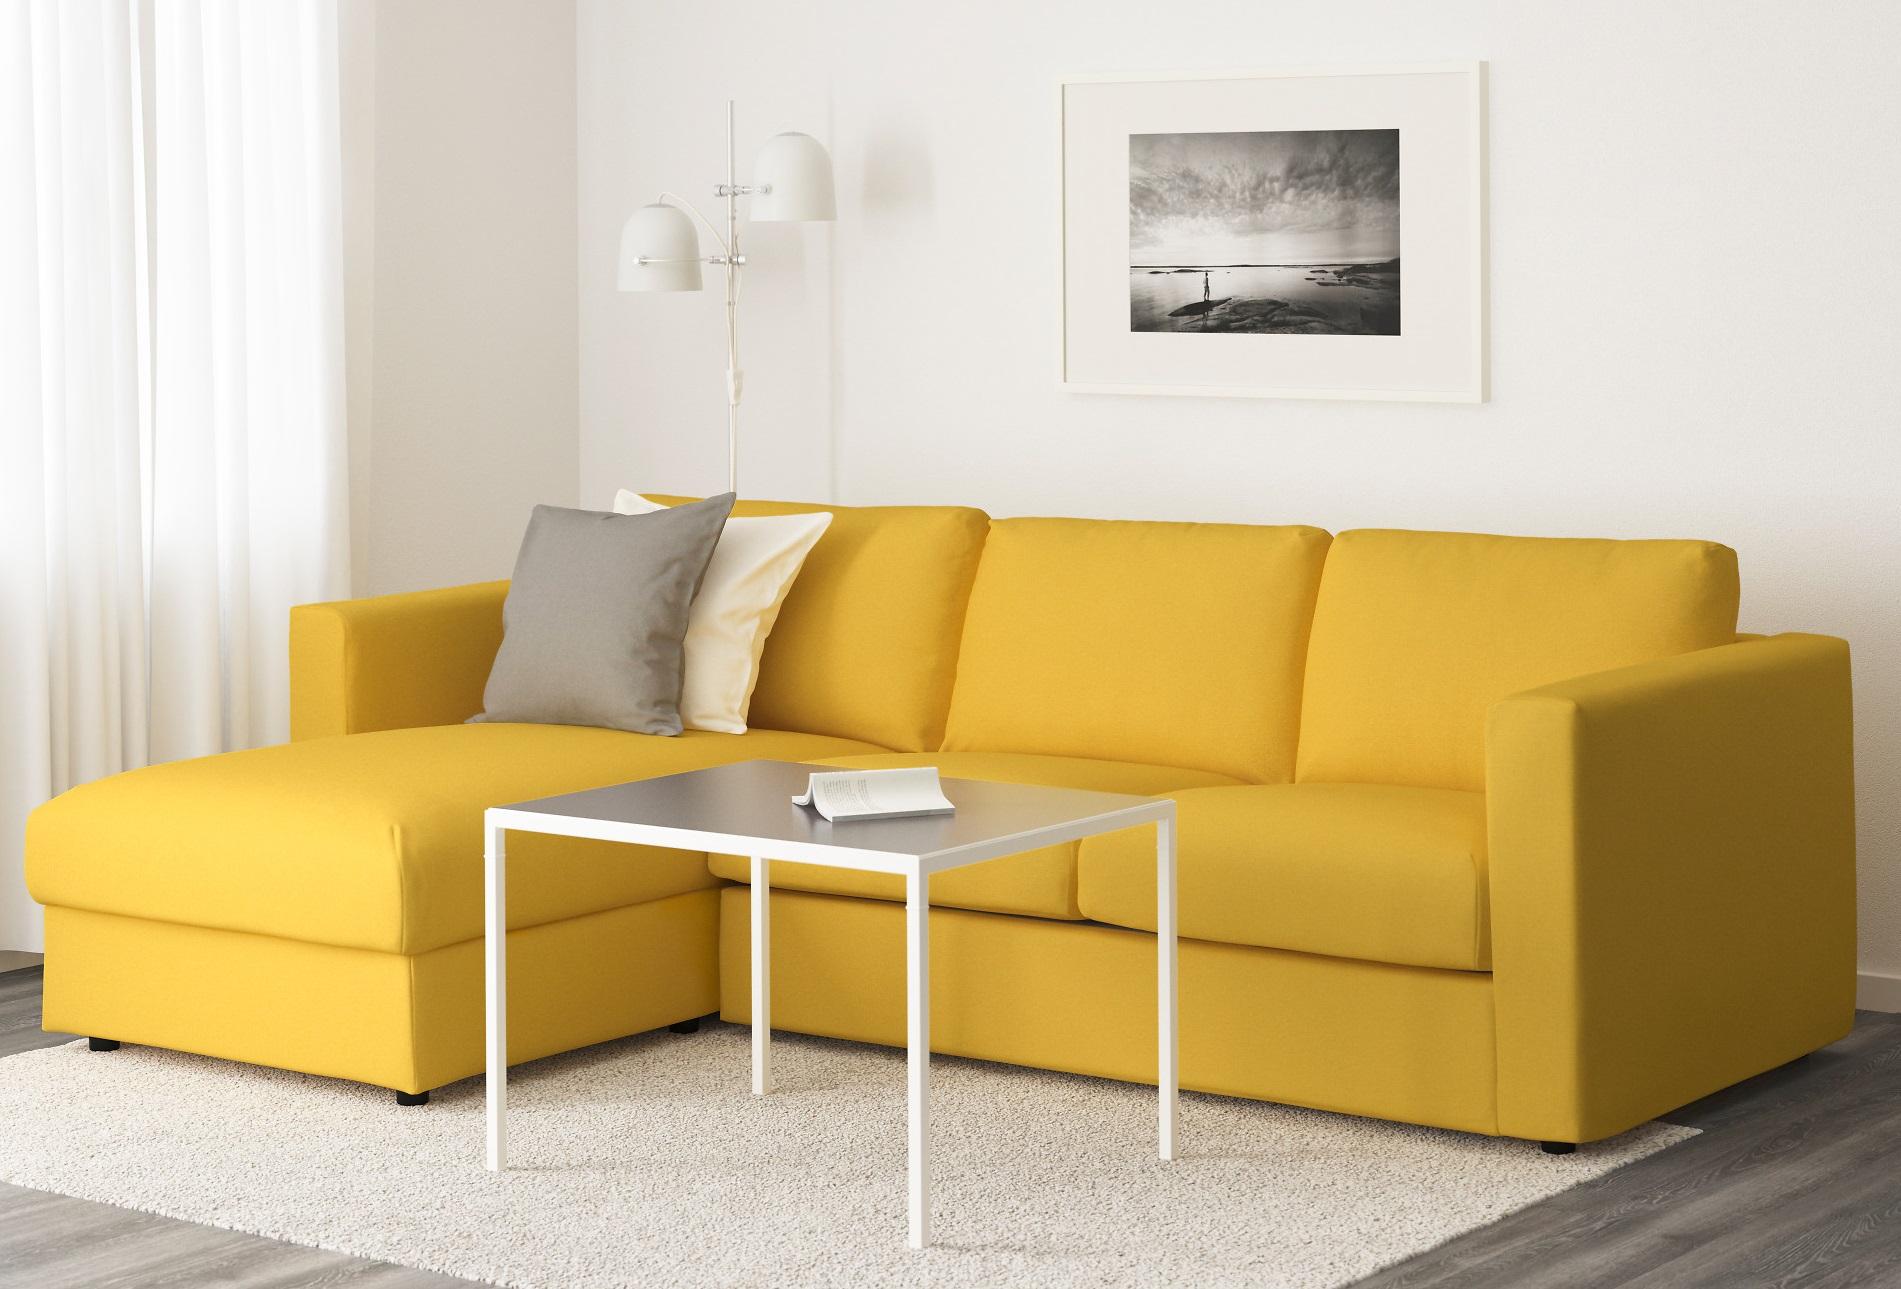 Трехместный желтый диван